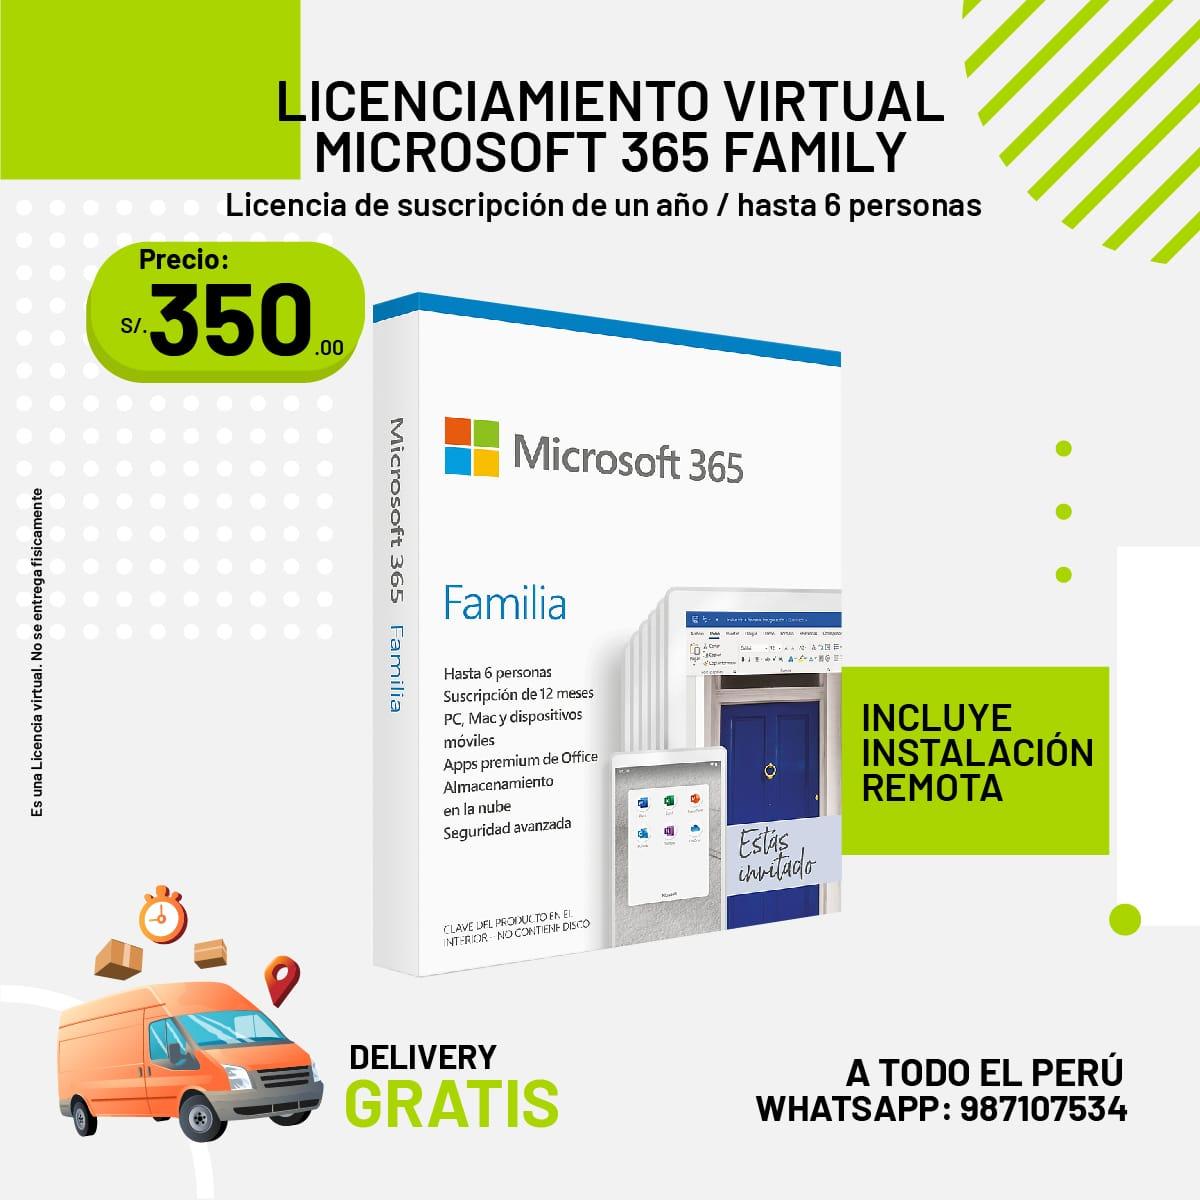 LICENCIAMIENTO VIRTUAL MICROSOFT 365 FAMILY